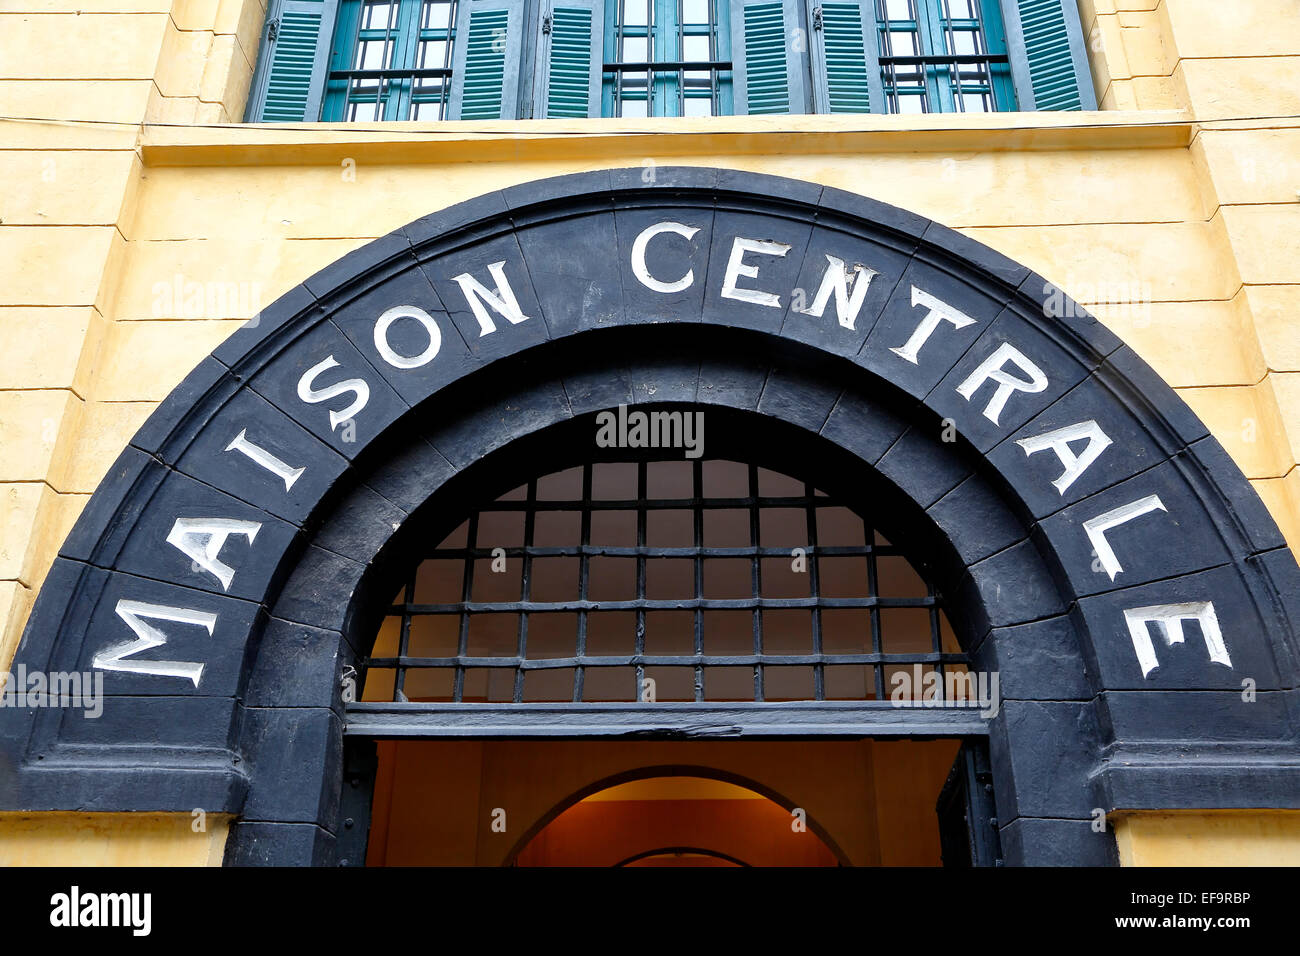 Entrance to Hoa Lo Prison (aka Hanoi Hilton), Hanoi, Vietnam - Stock Image